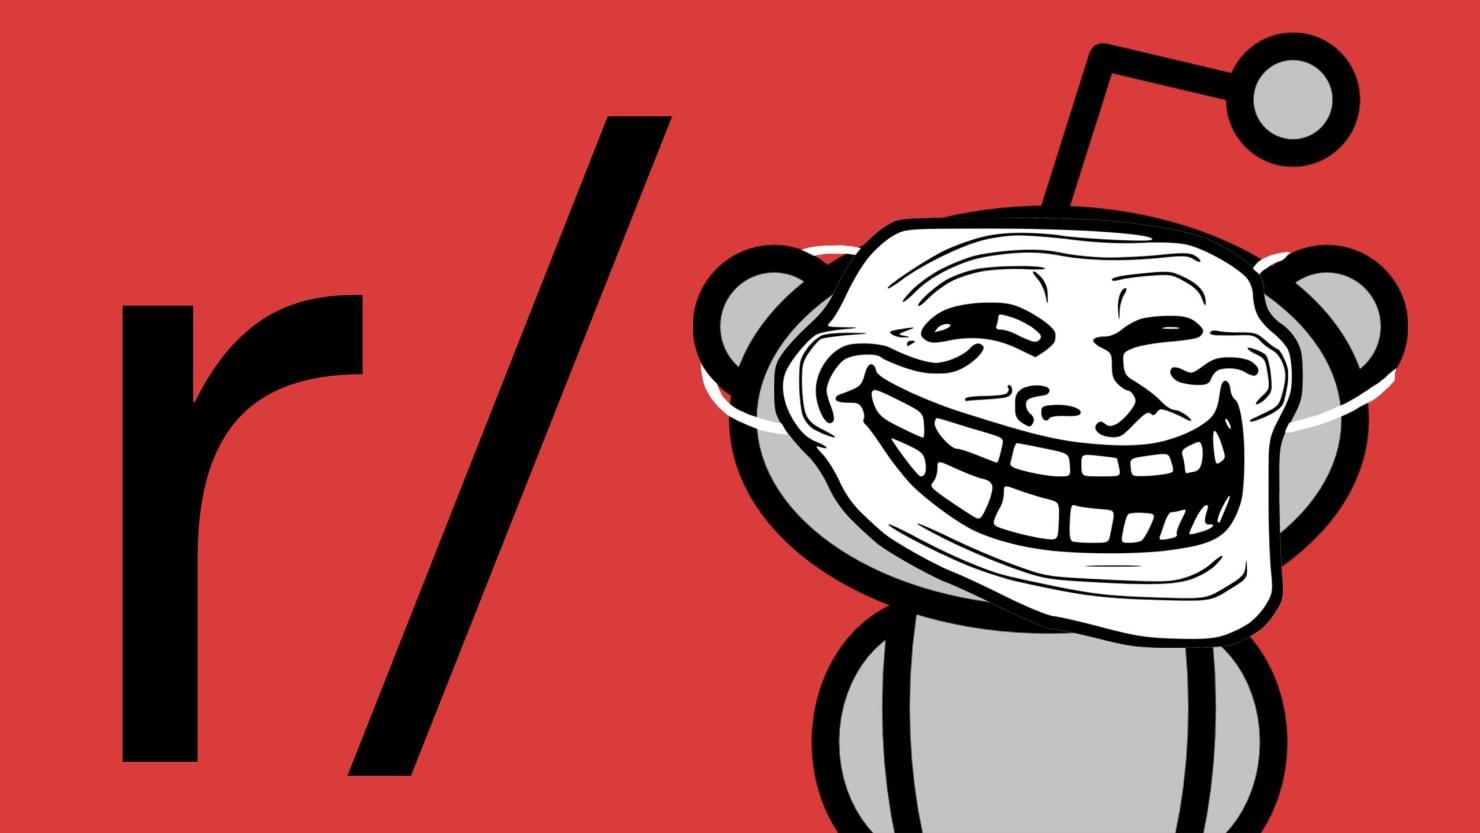 Russian Troll Farm Internet Research Agency Held a Bizarre Reddit AMA With Itself